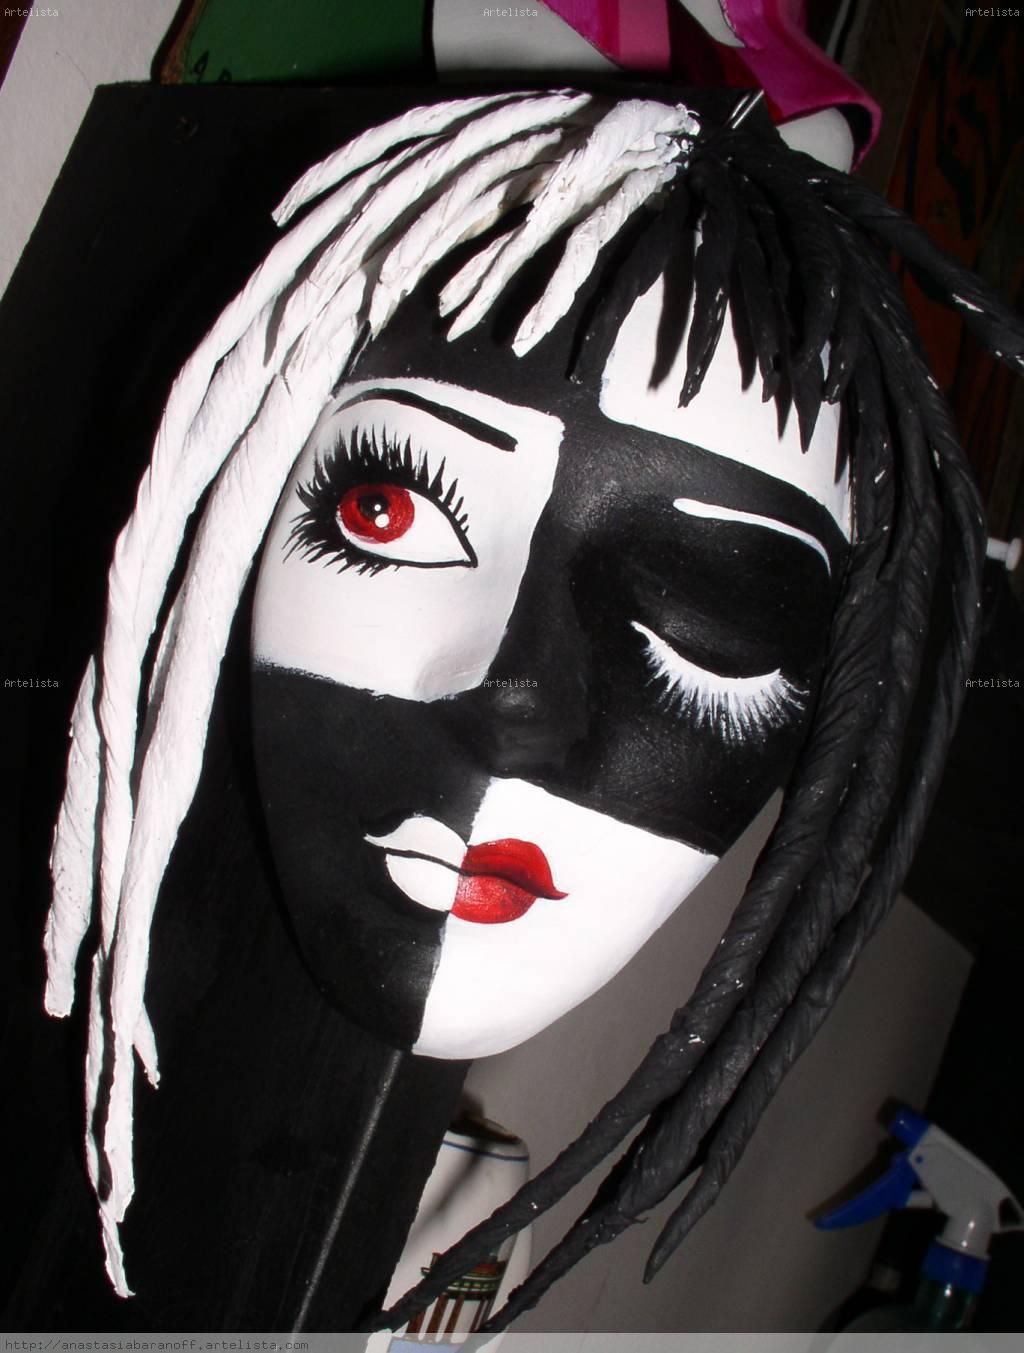 Blanco y negro anastasia baranoff - Blanco y negro paint ...